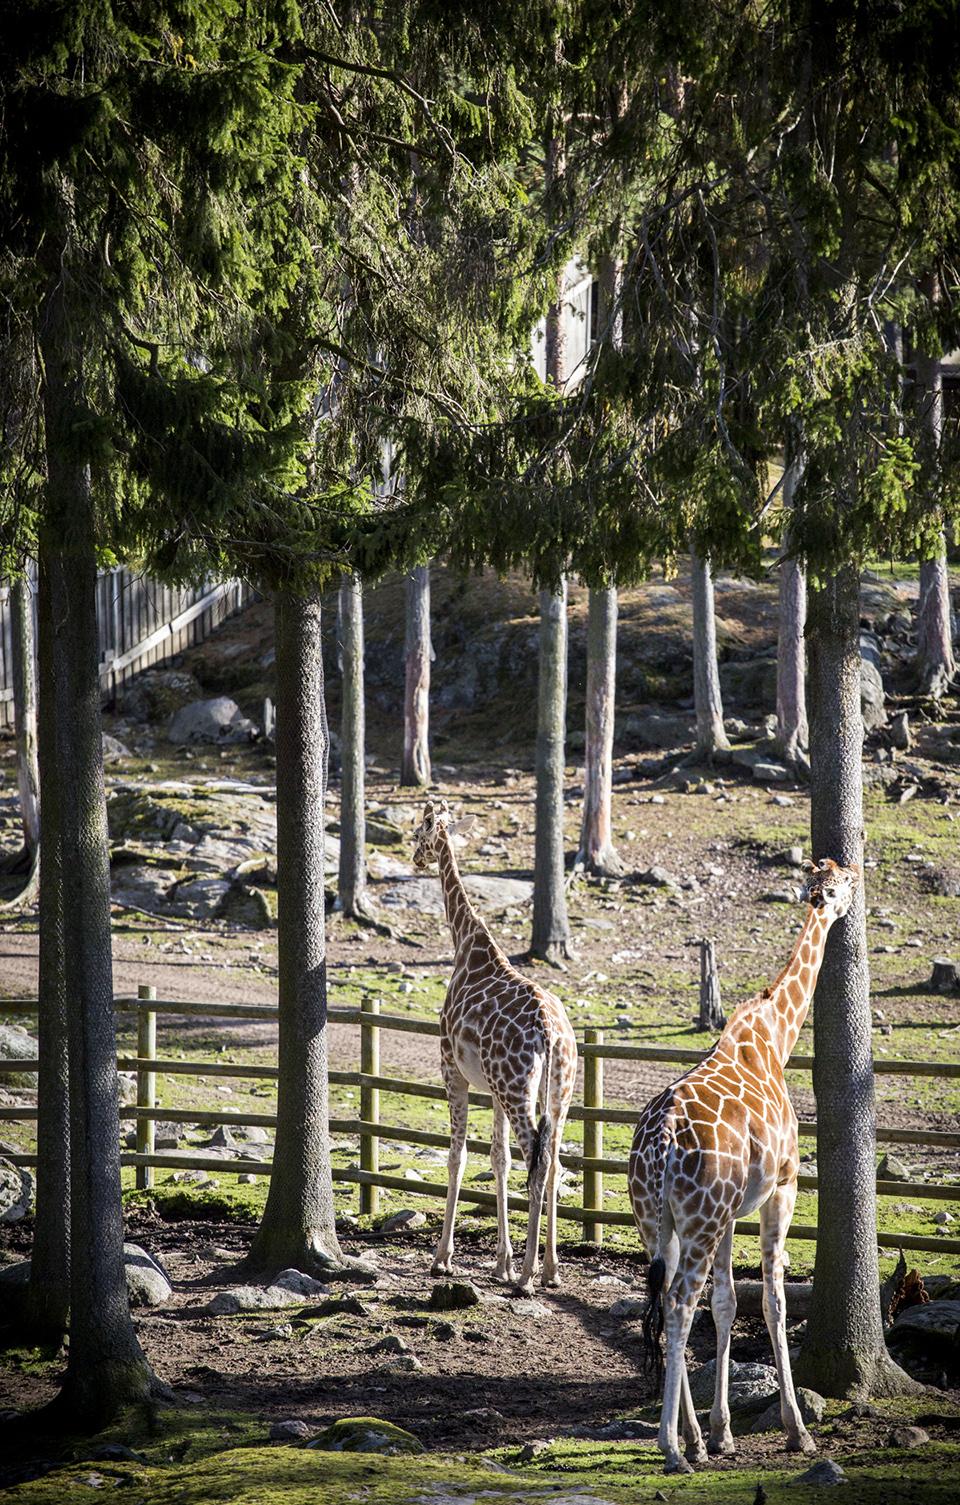 Giraff-kolmården